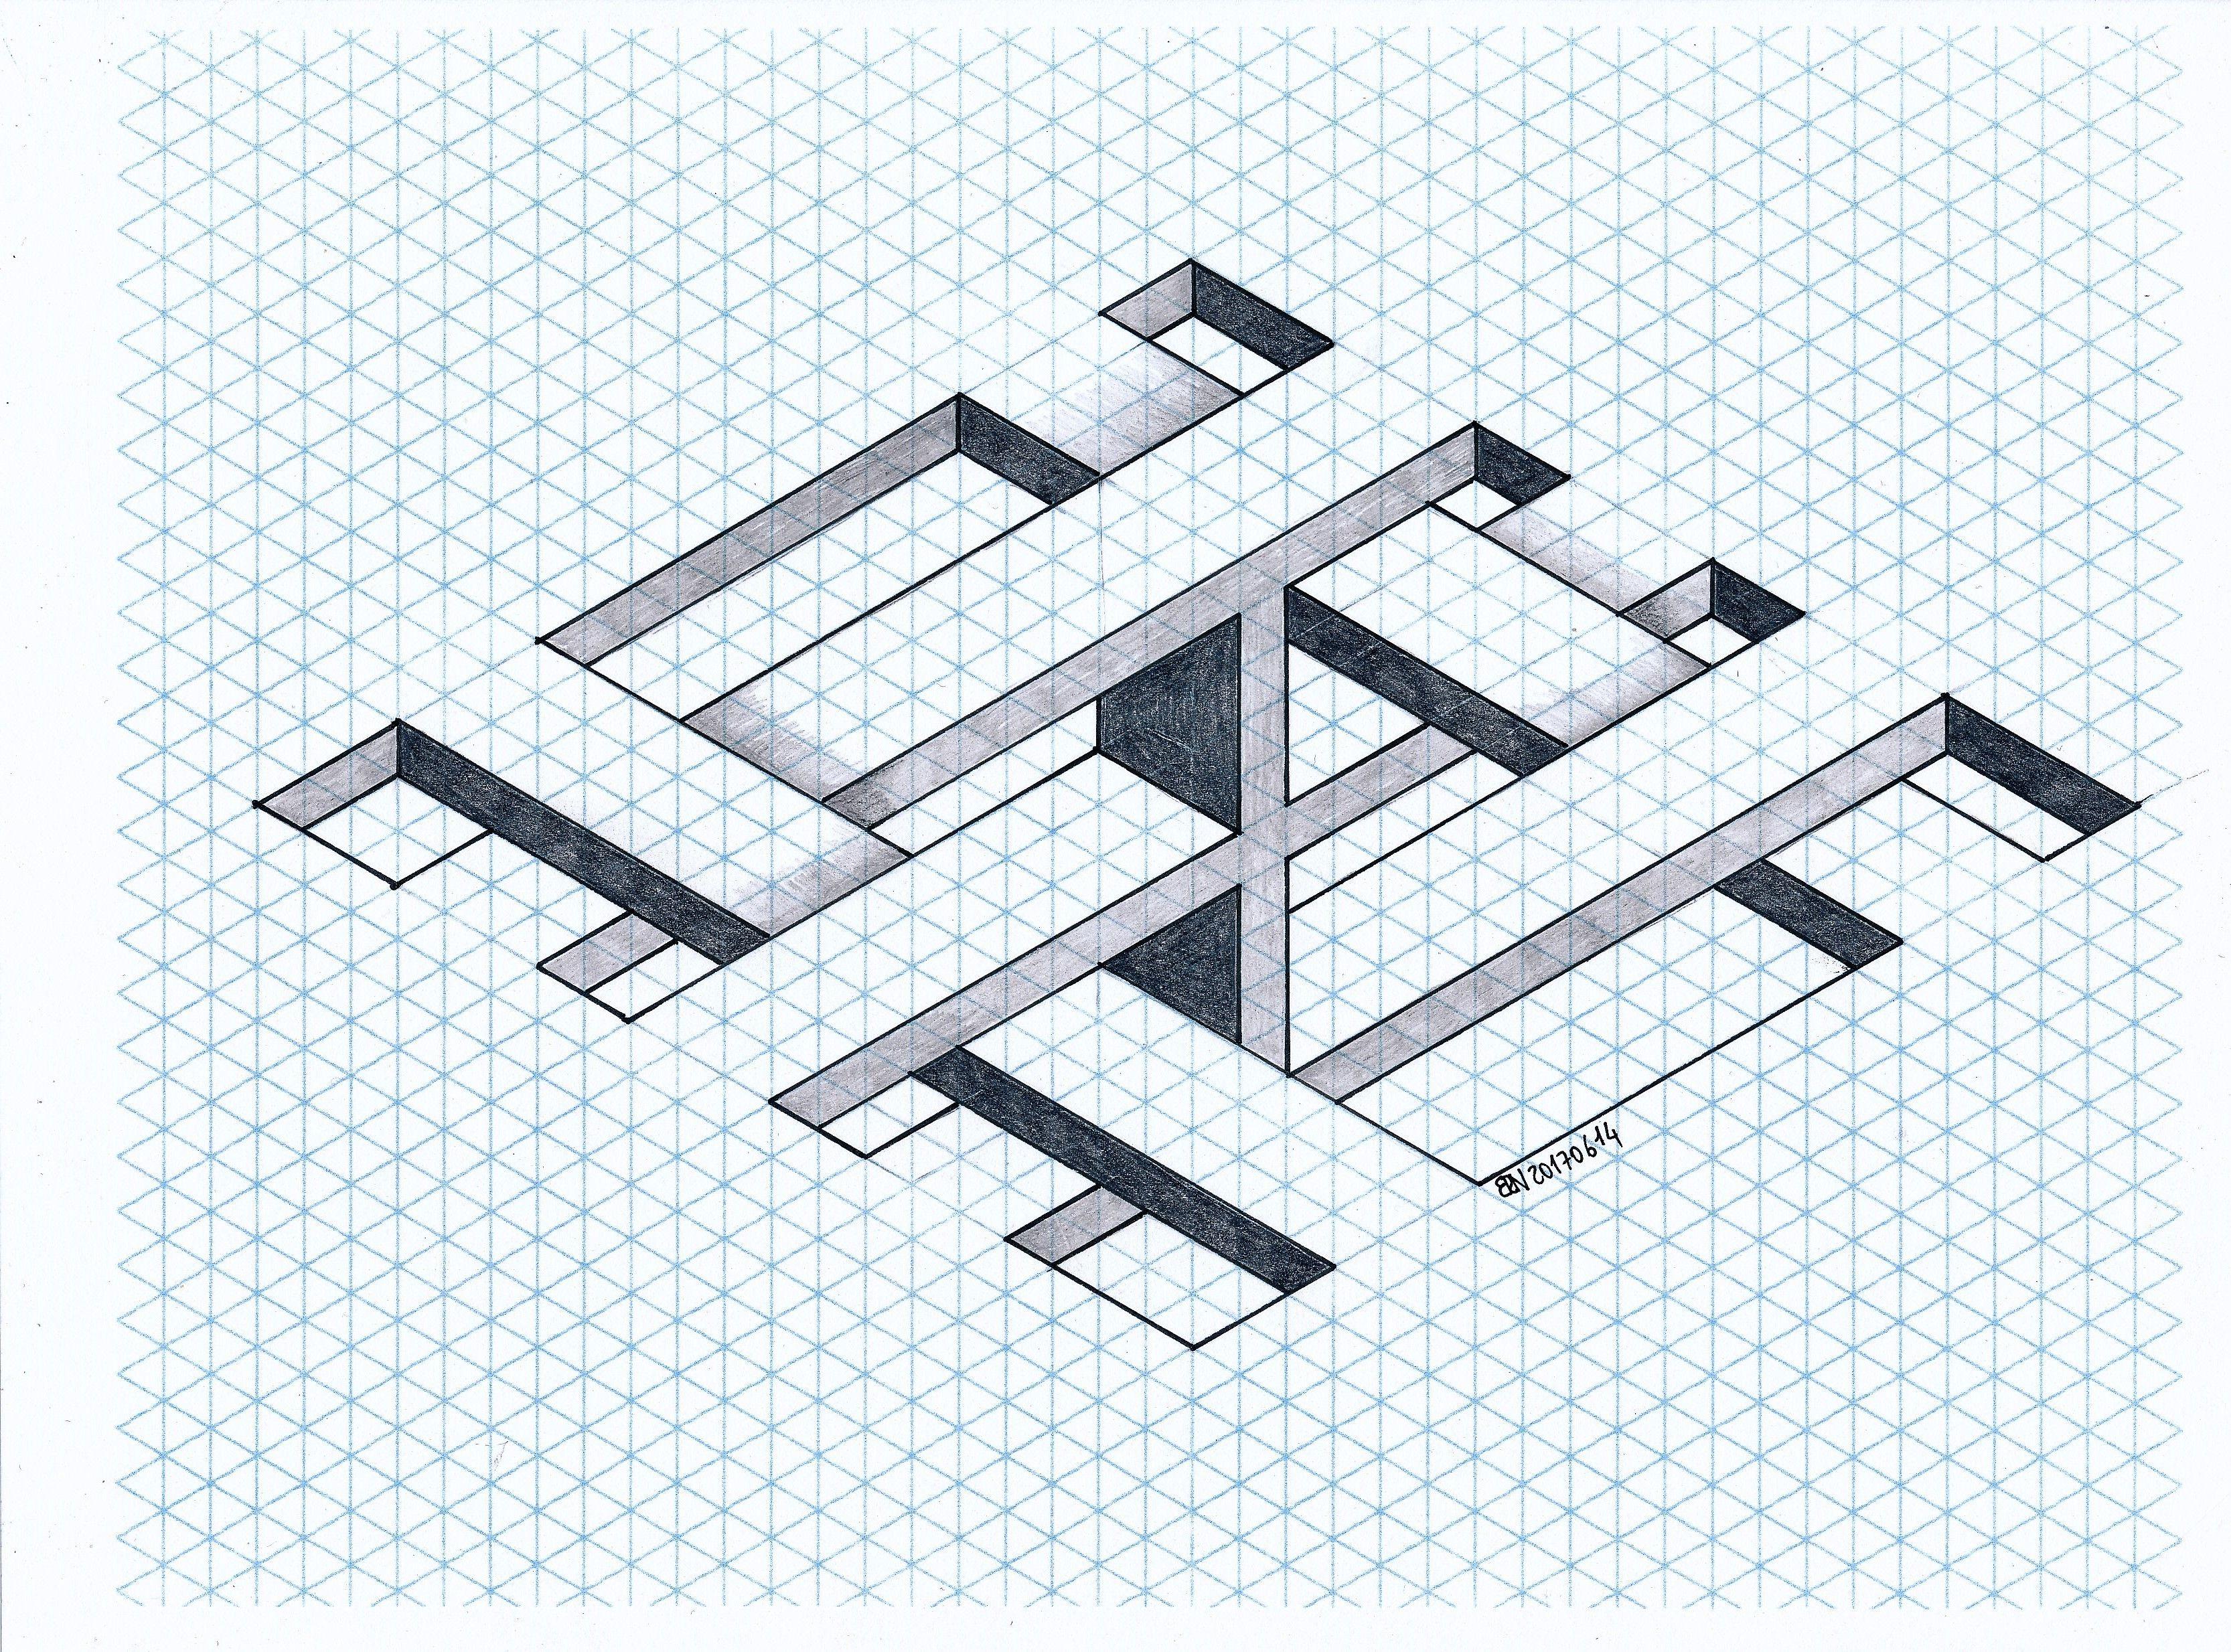 Impossible isometric penrose triangle mathart regolo54 impossible isometric penrose triangle mathart regolo54 geometry symmetry pooptronica